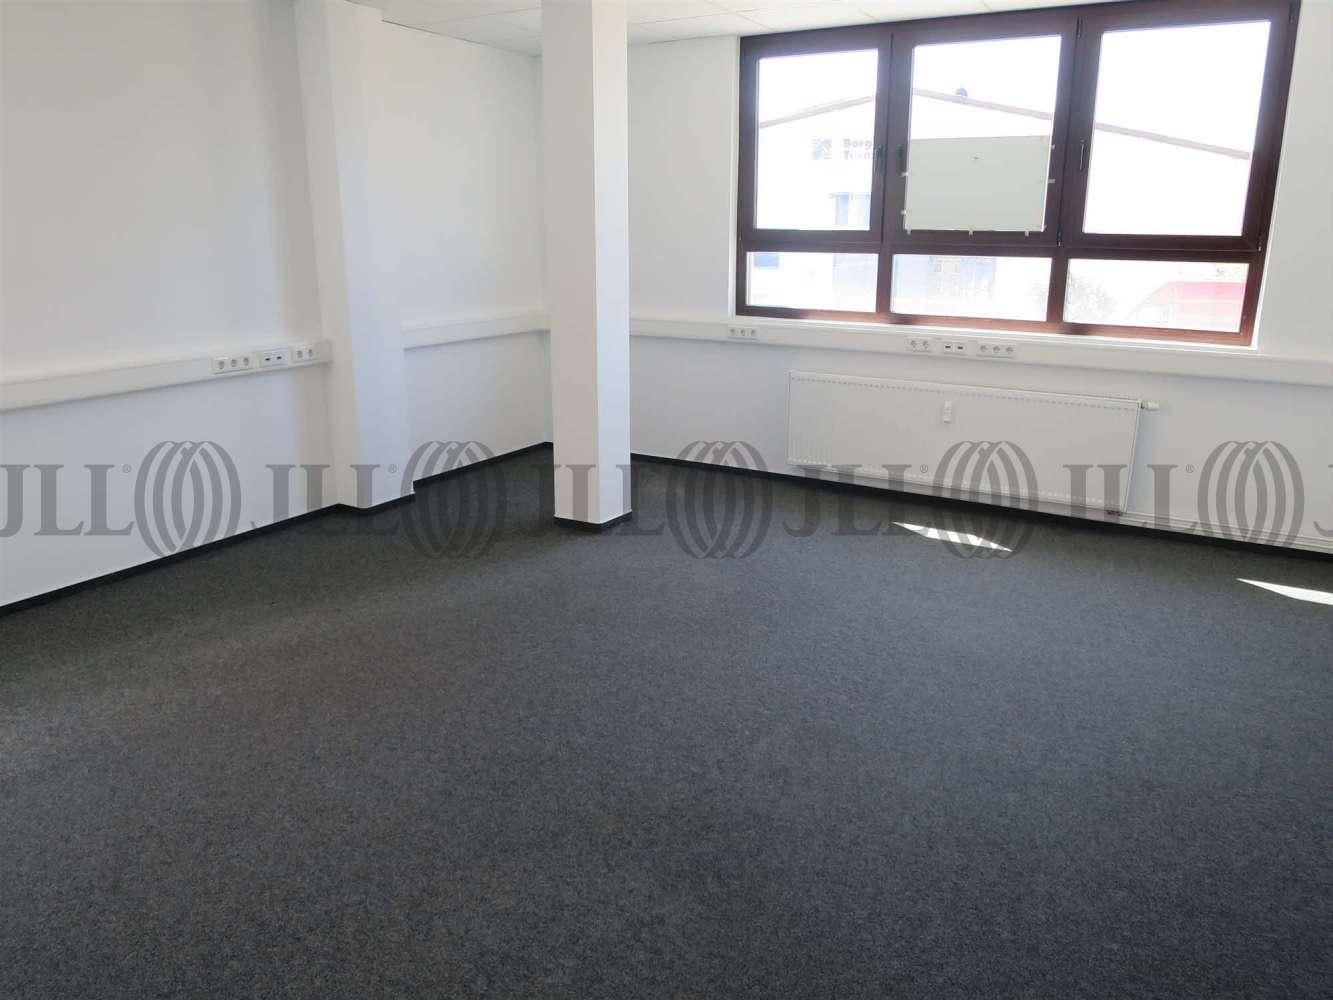 Büros Heidelberg, 69123 - Büro - Heidelberg, Pfaffengrund - F2195 - 10873705